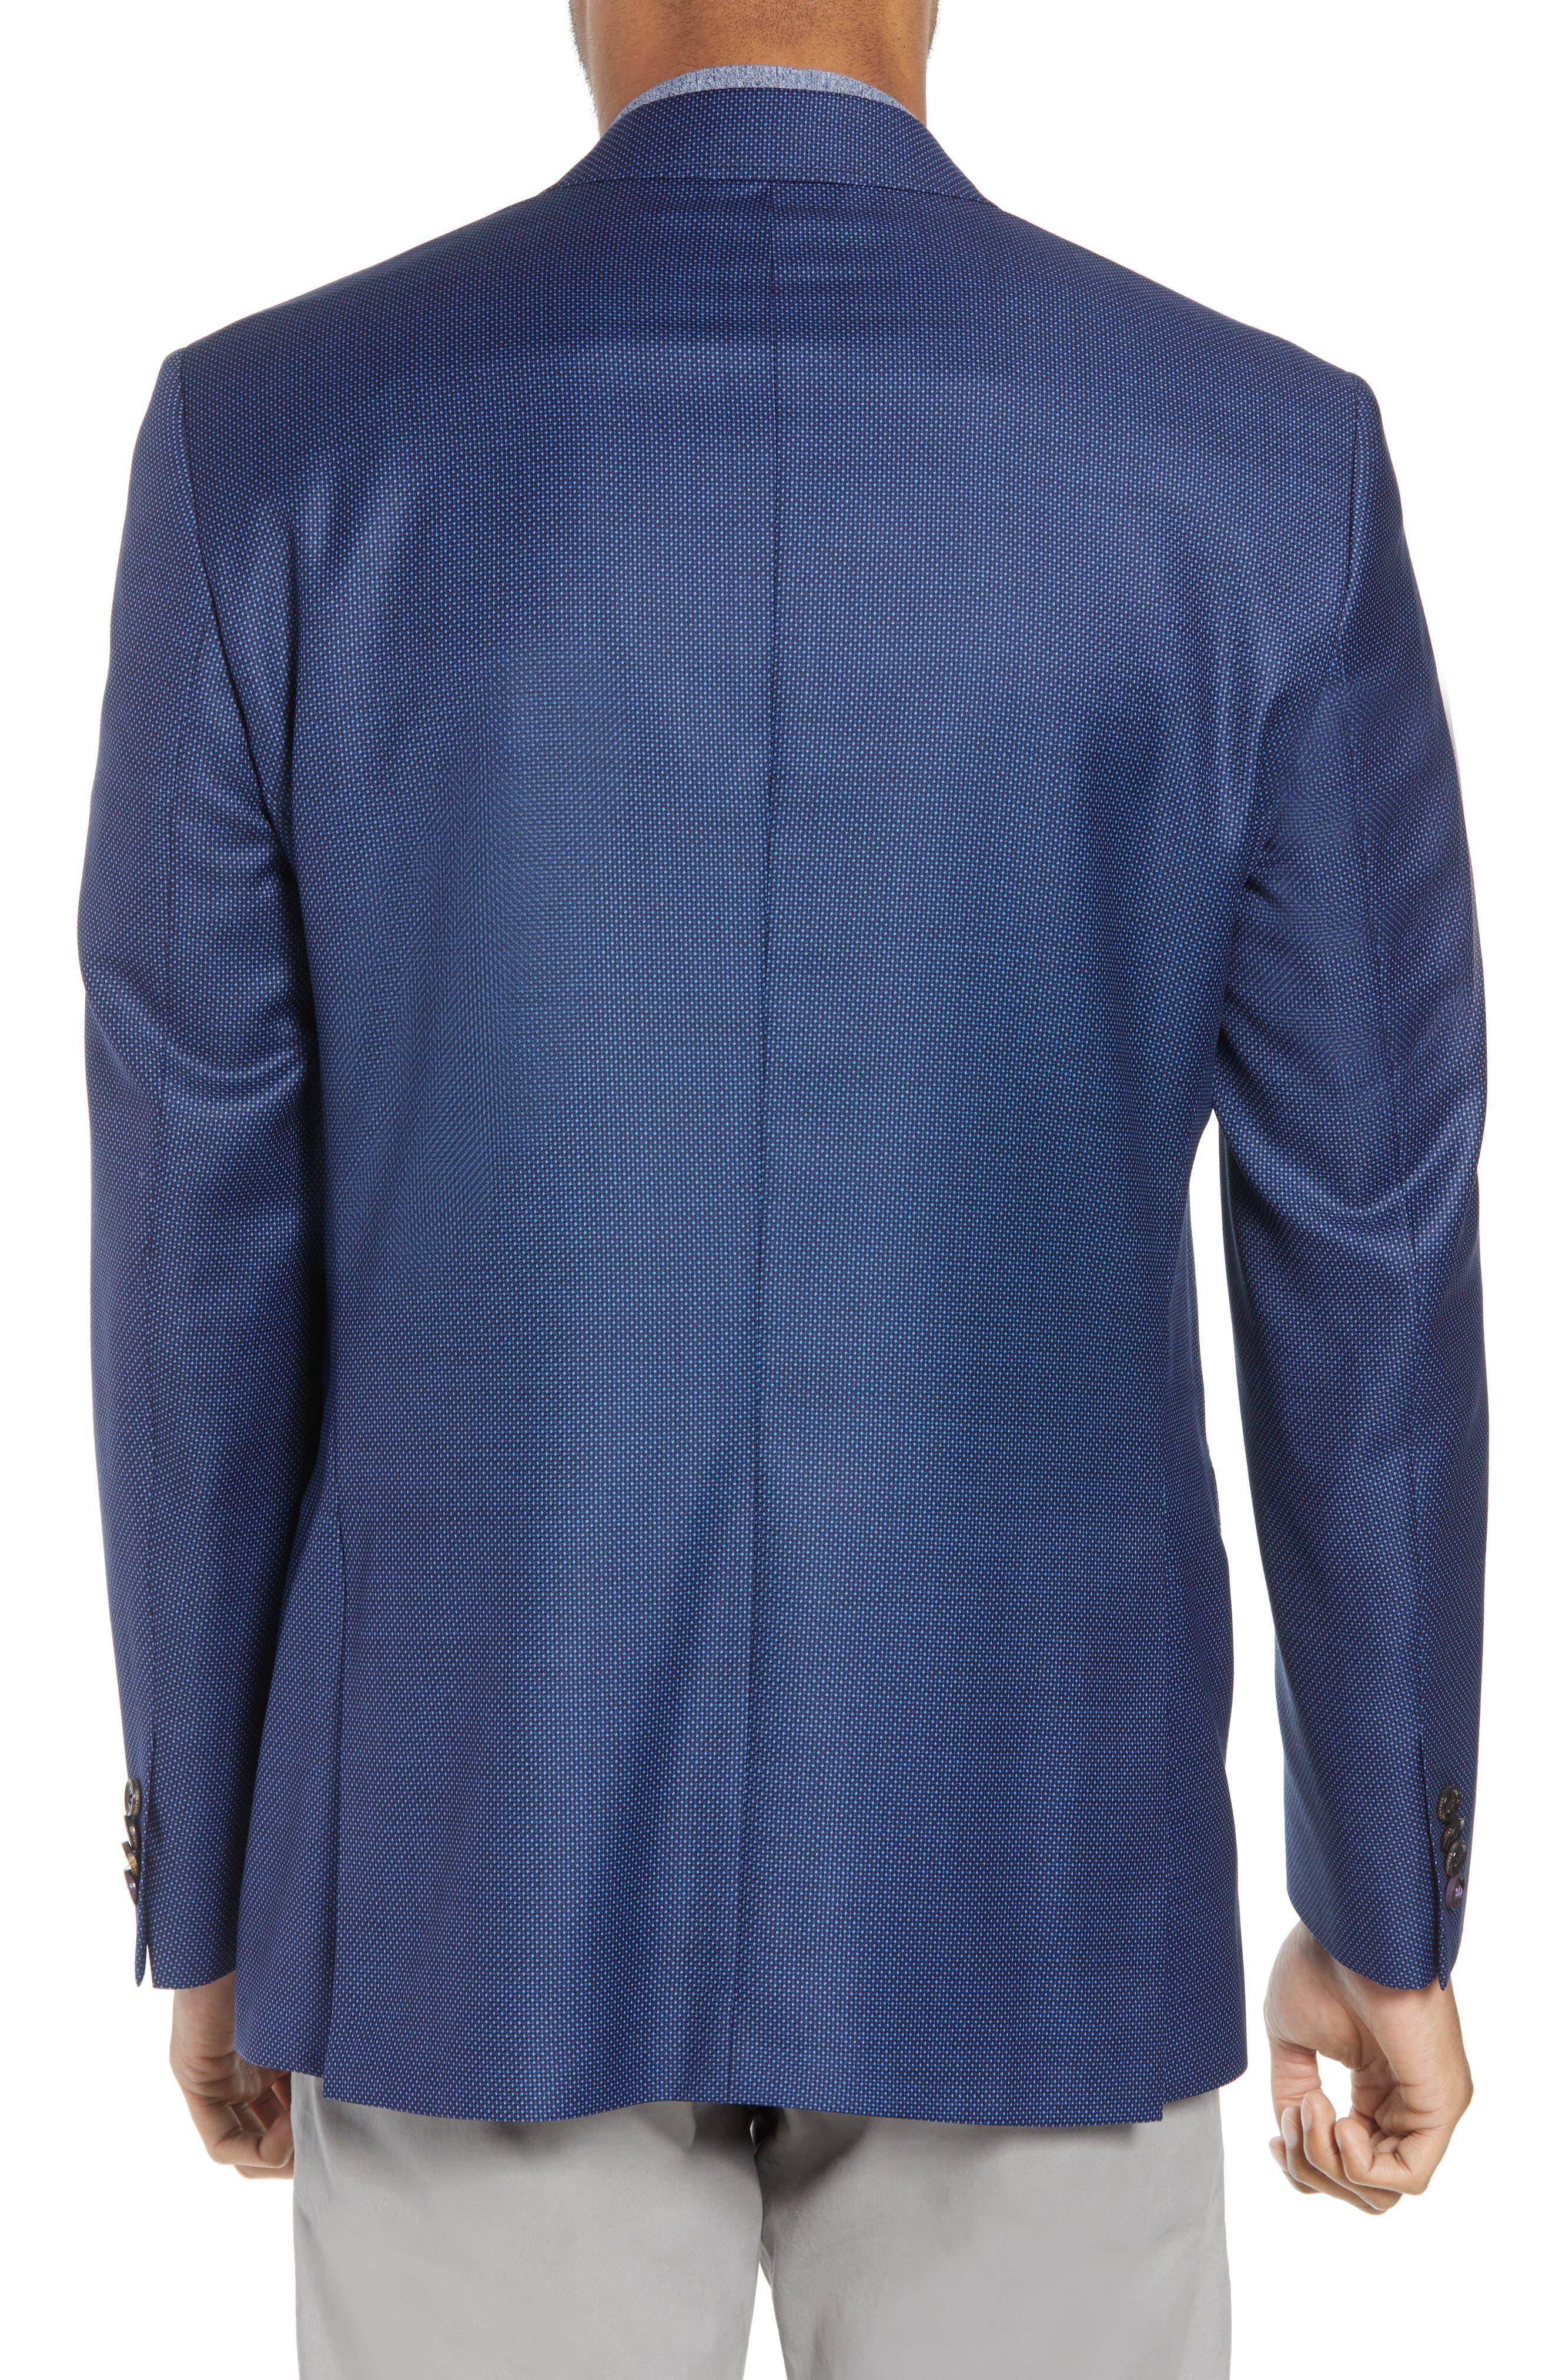 Jay Trim Fit Microdot Wool Sport Coat,                             Alternate thumbnail 2, color,                             400